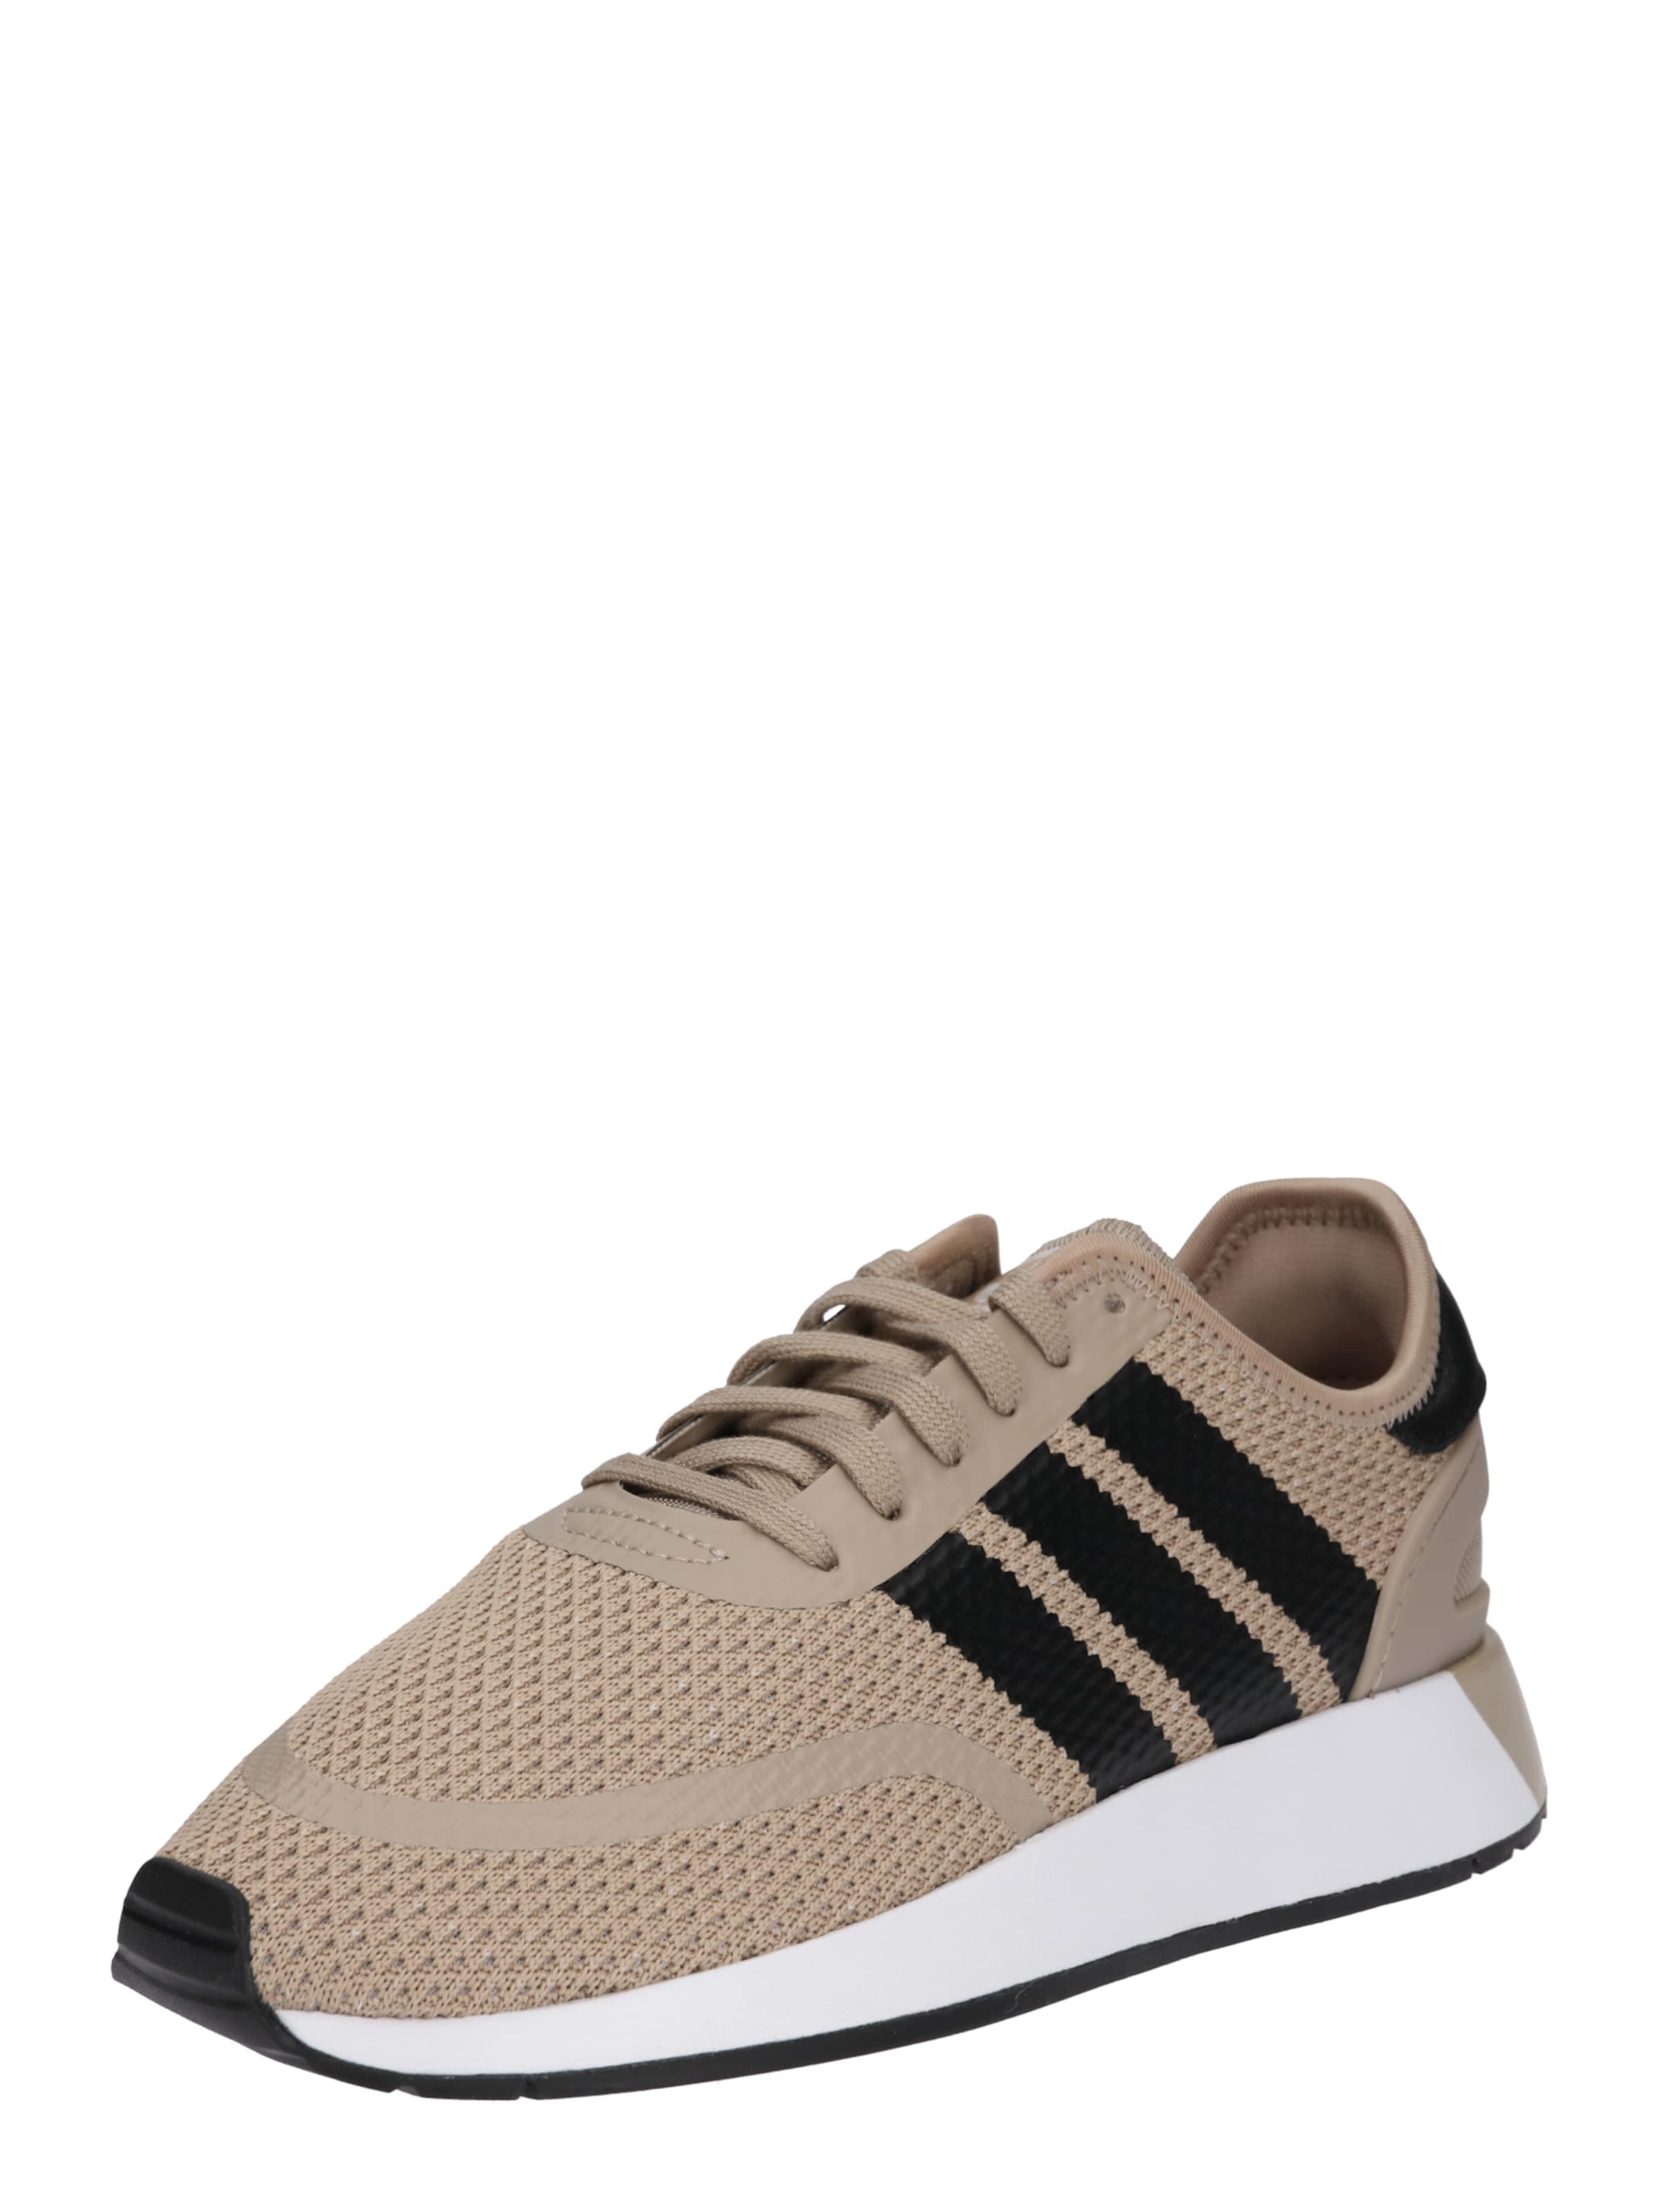 Khaki Adidas Originals Sneaker In 'n 5923' 5LRjc3A4qS